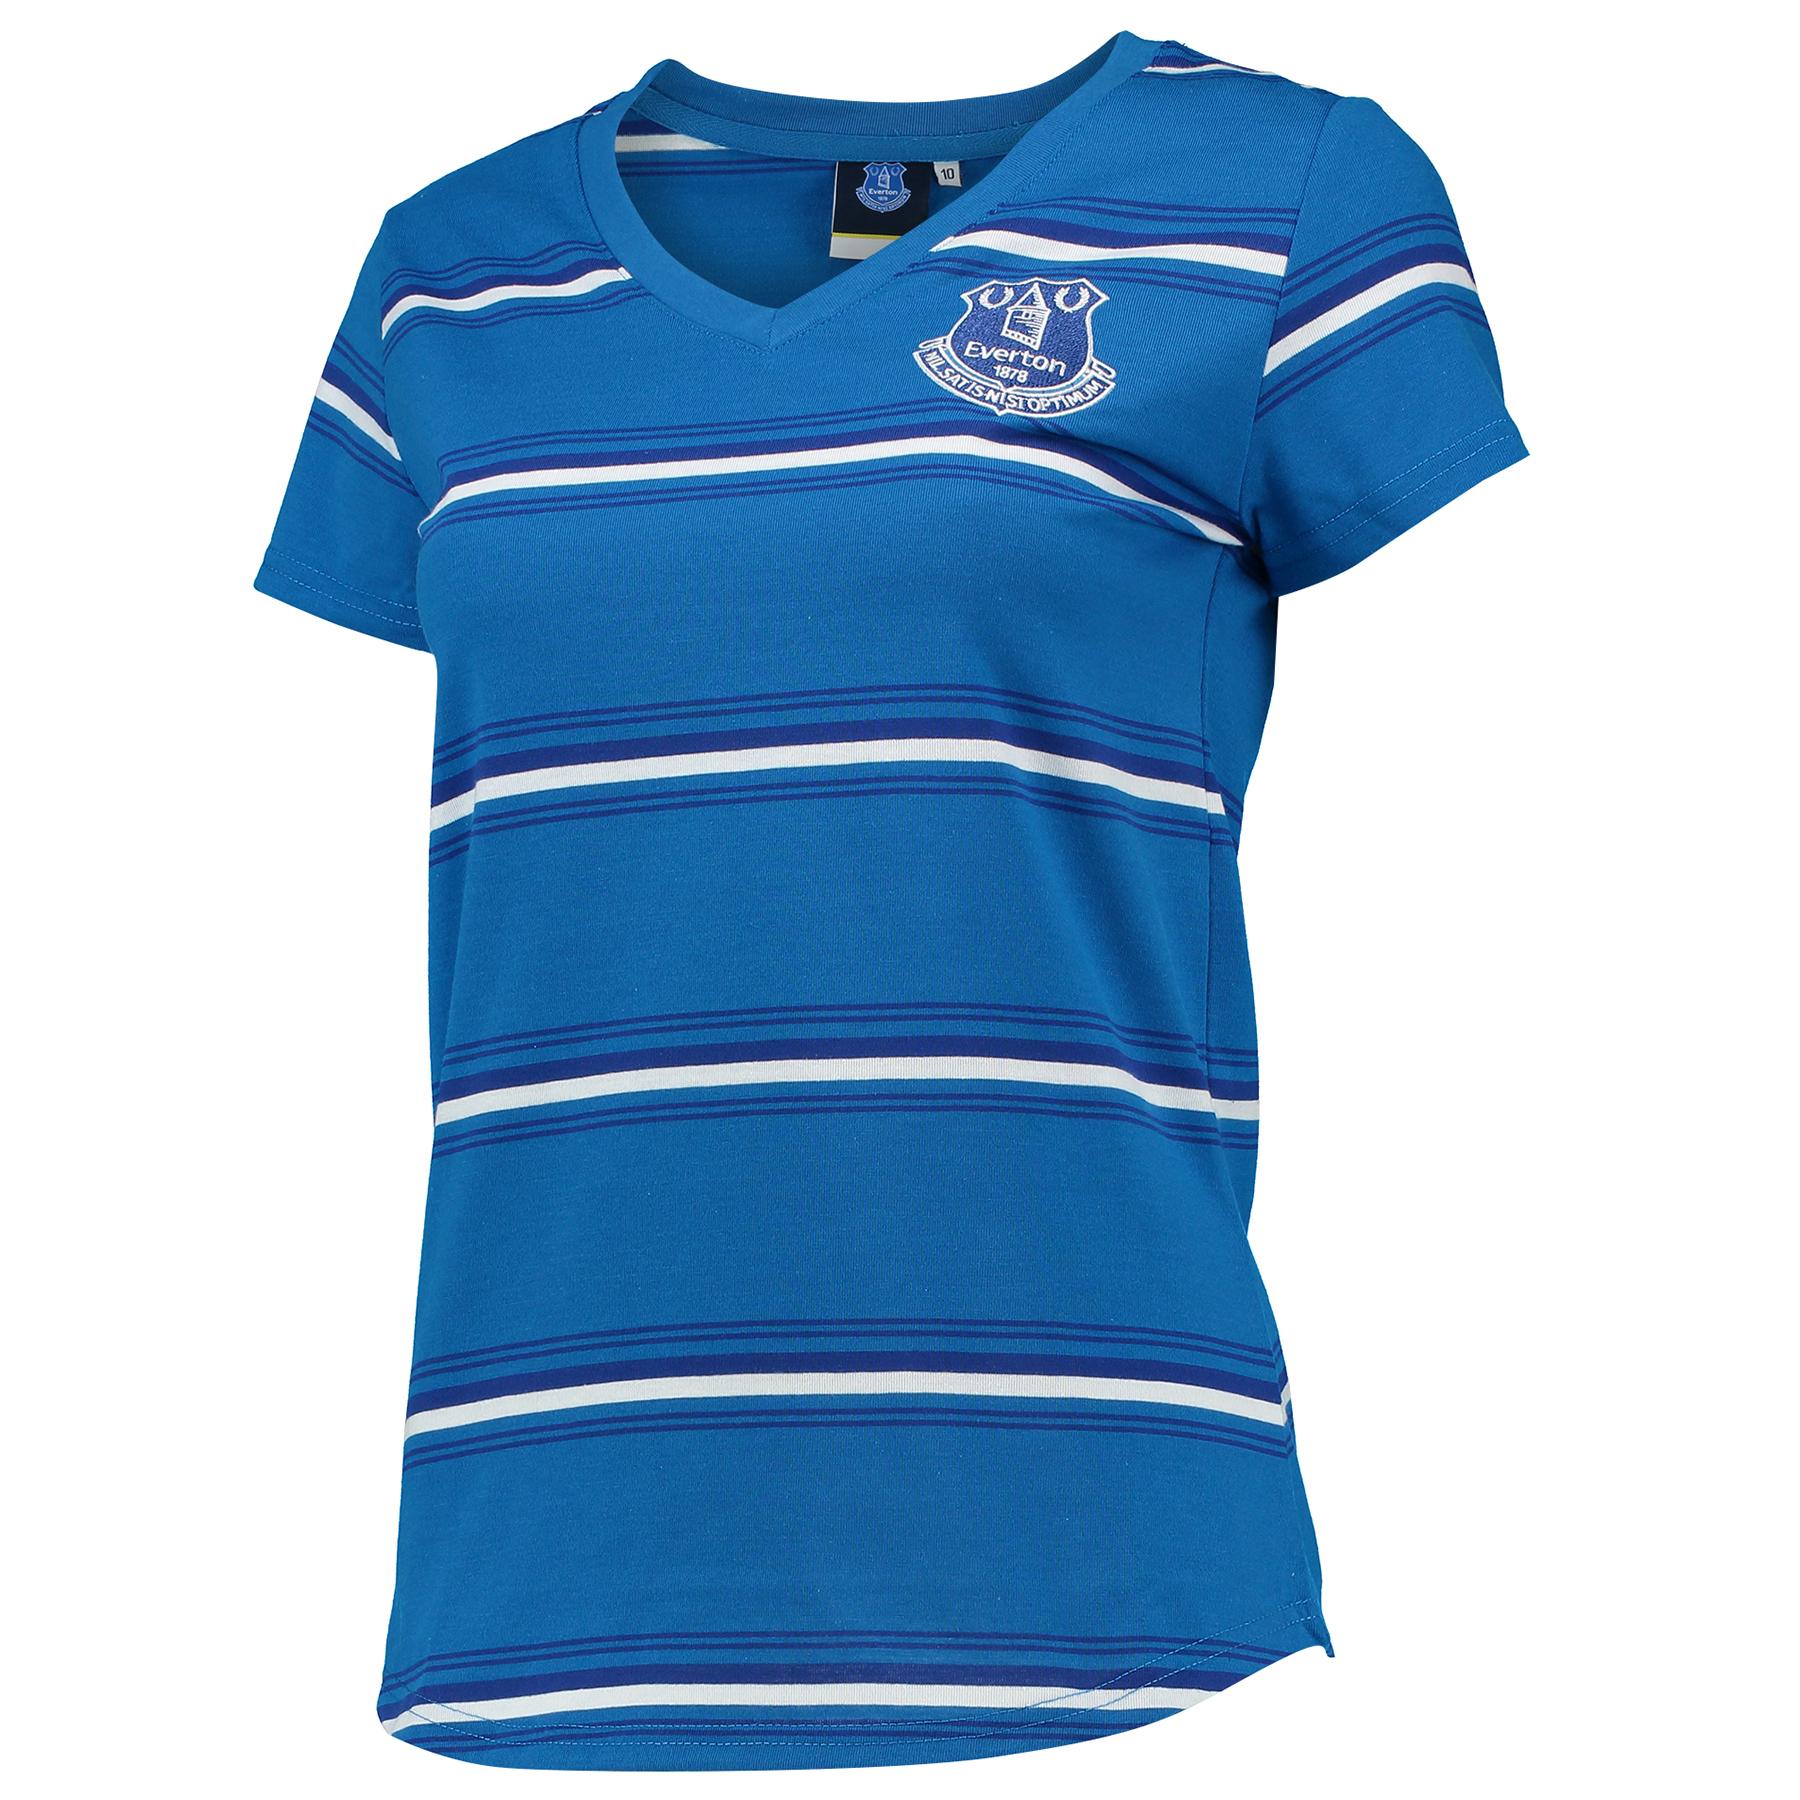 Everton Stripe T-Shirt - Navy - Womens